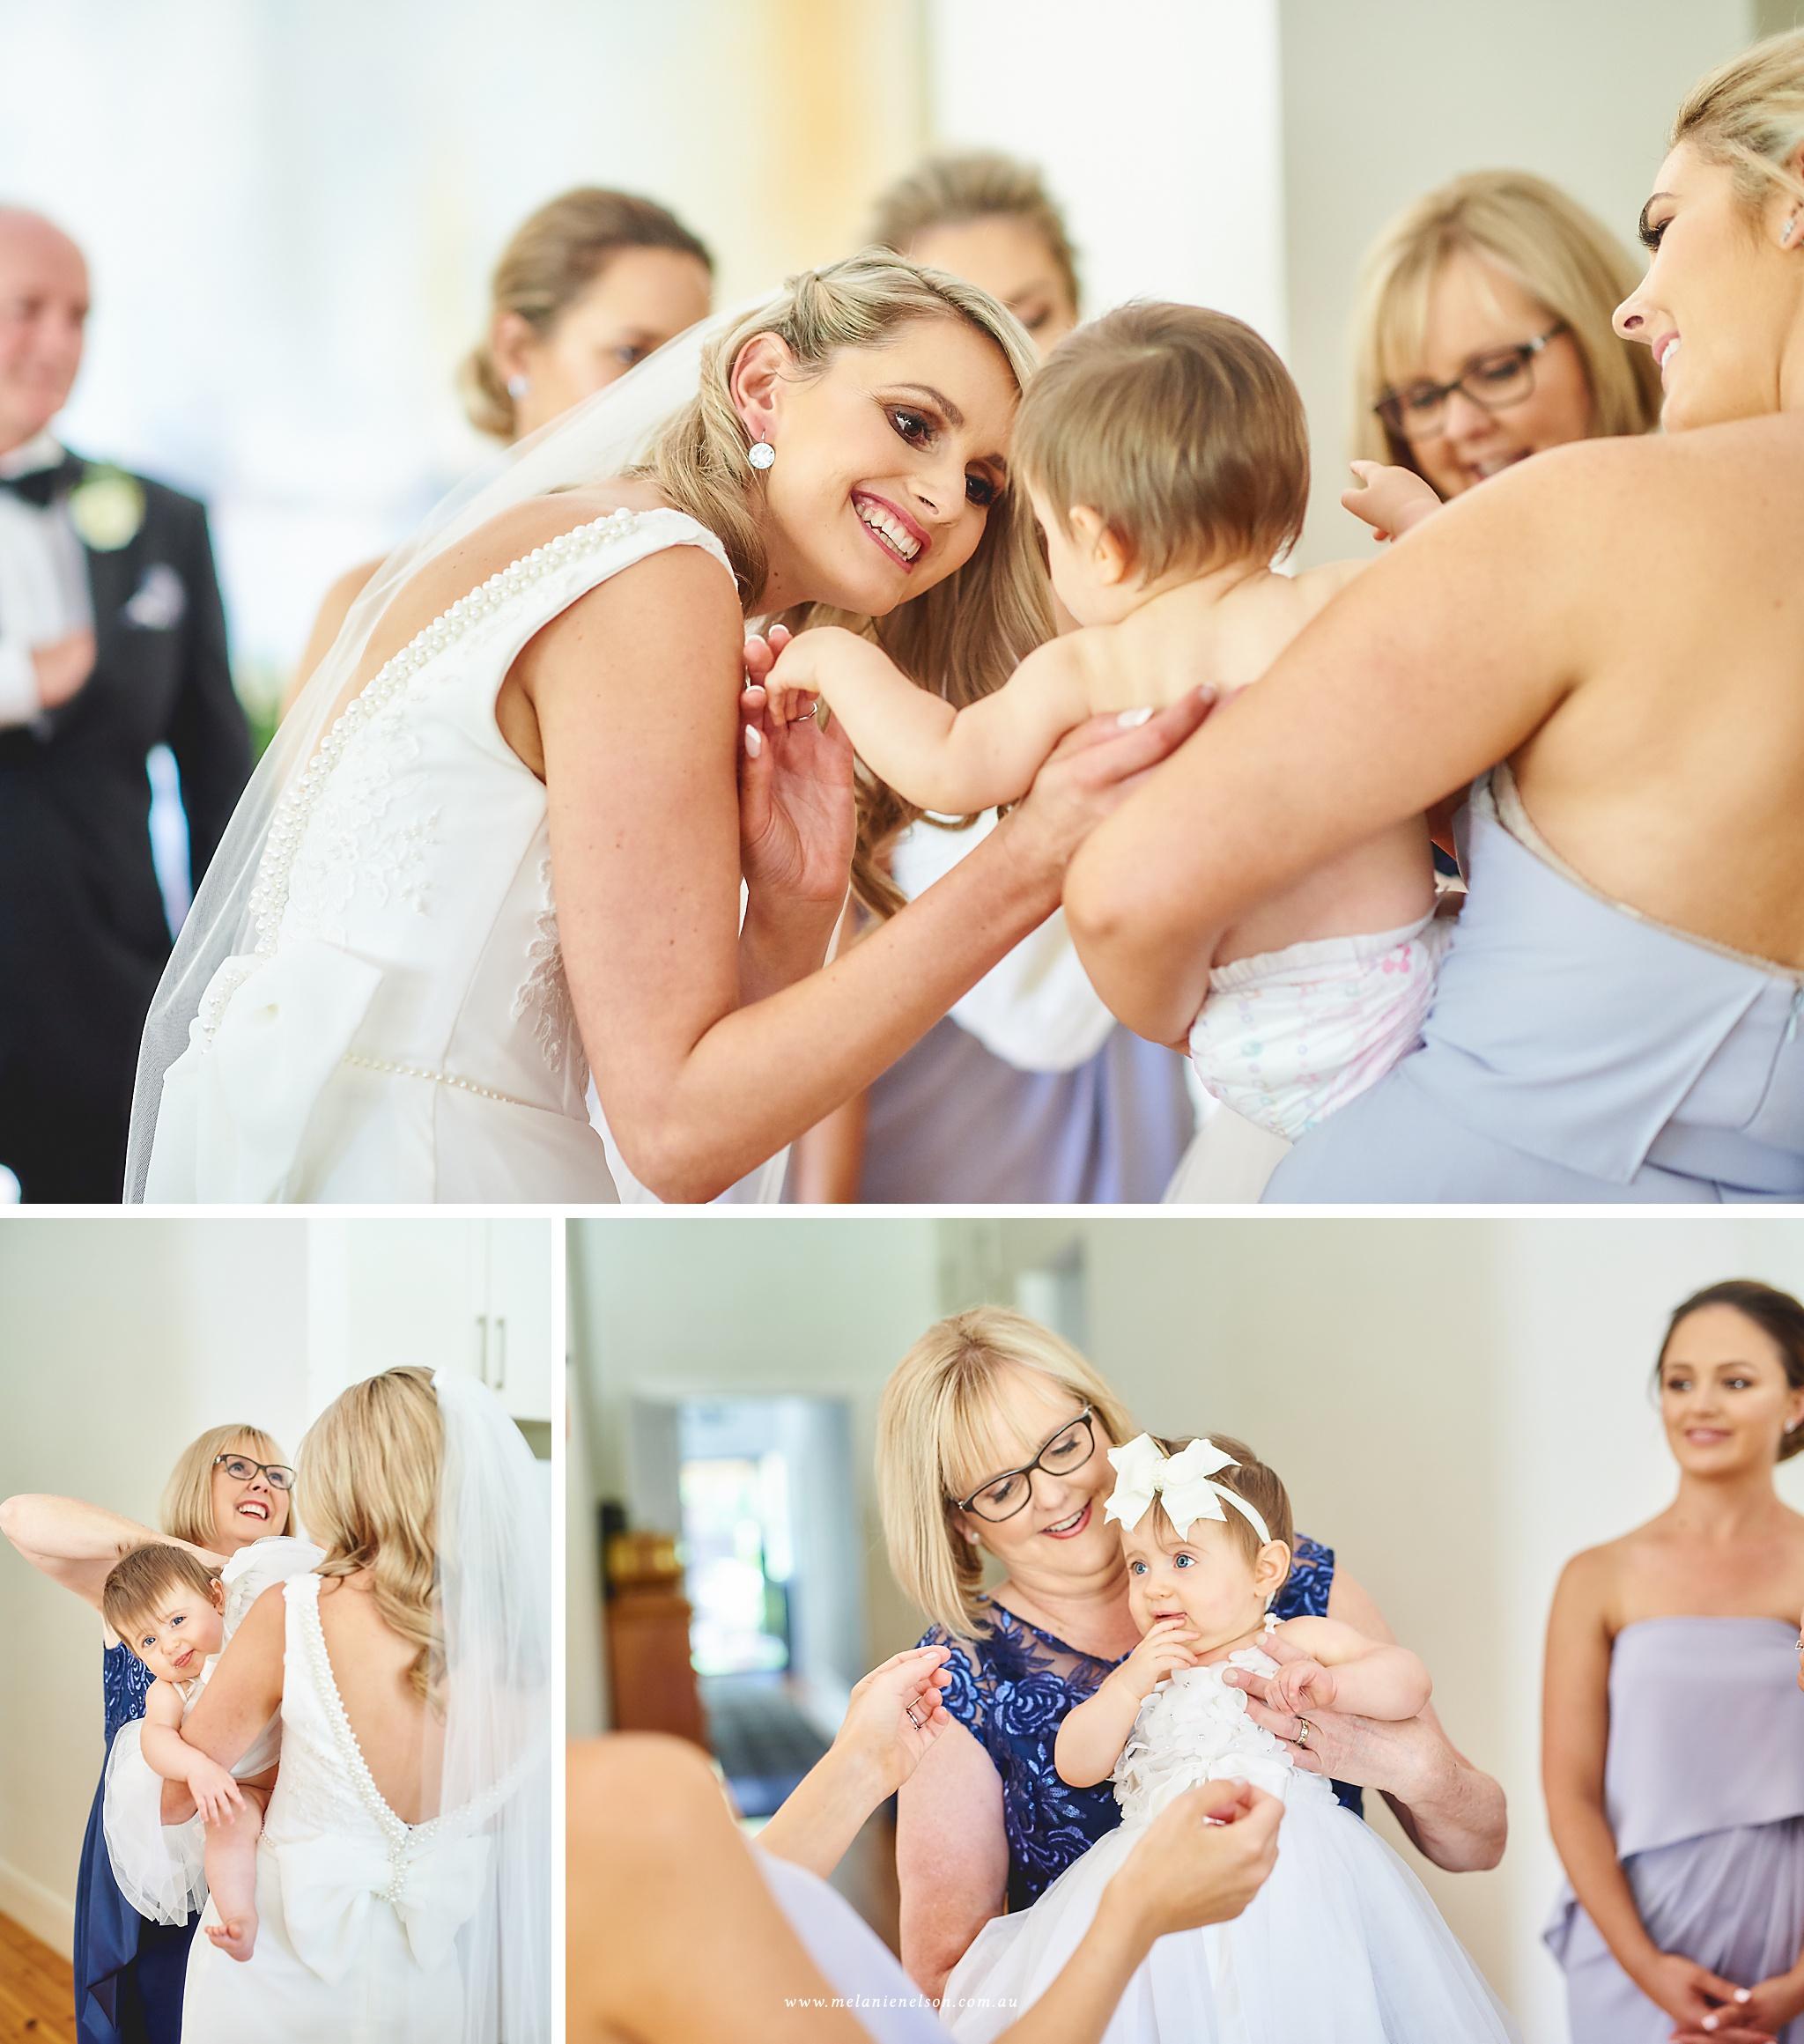 longview_vineyard_wedding_0010.jpg